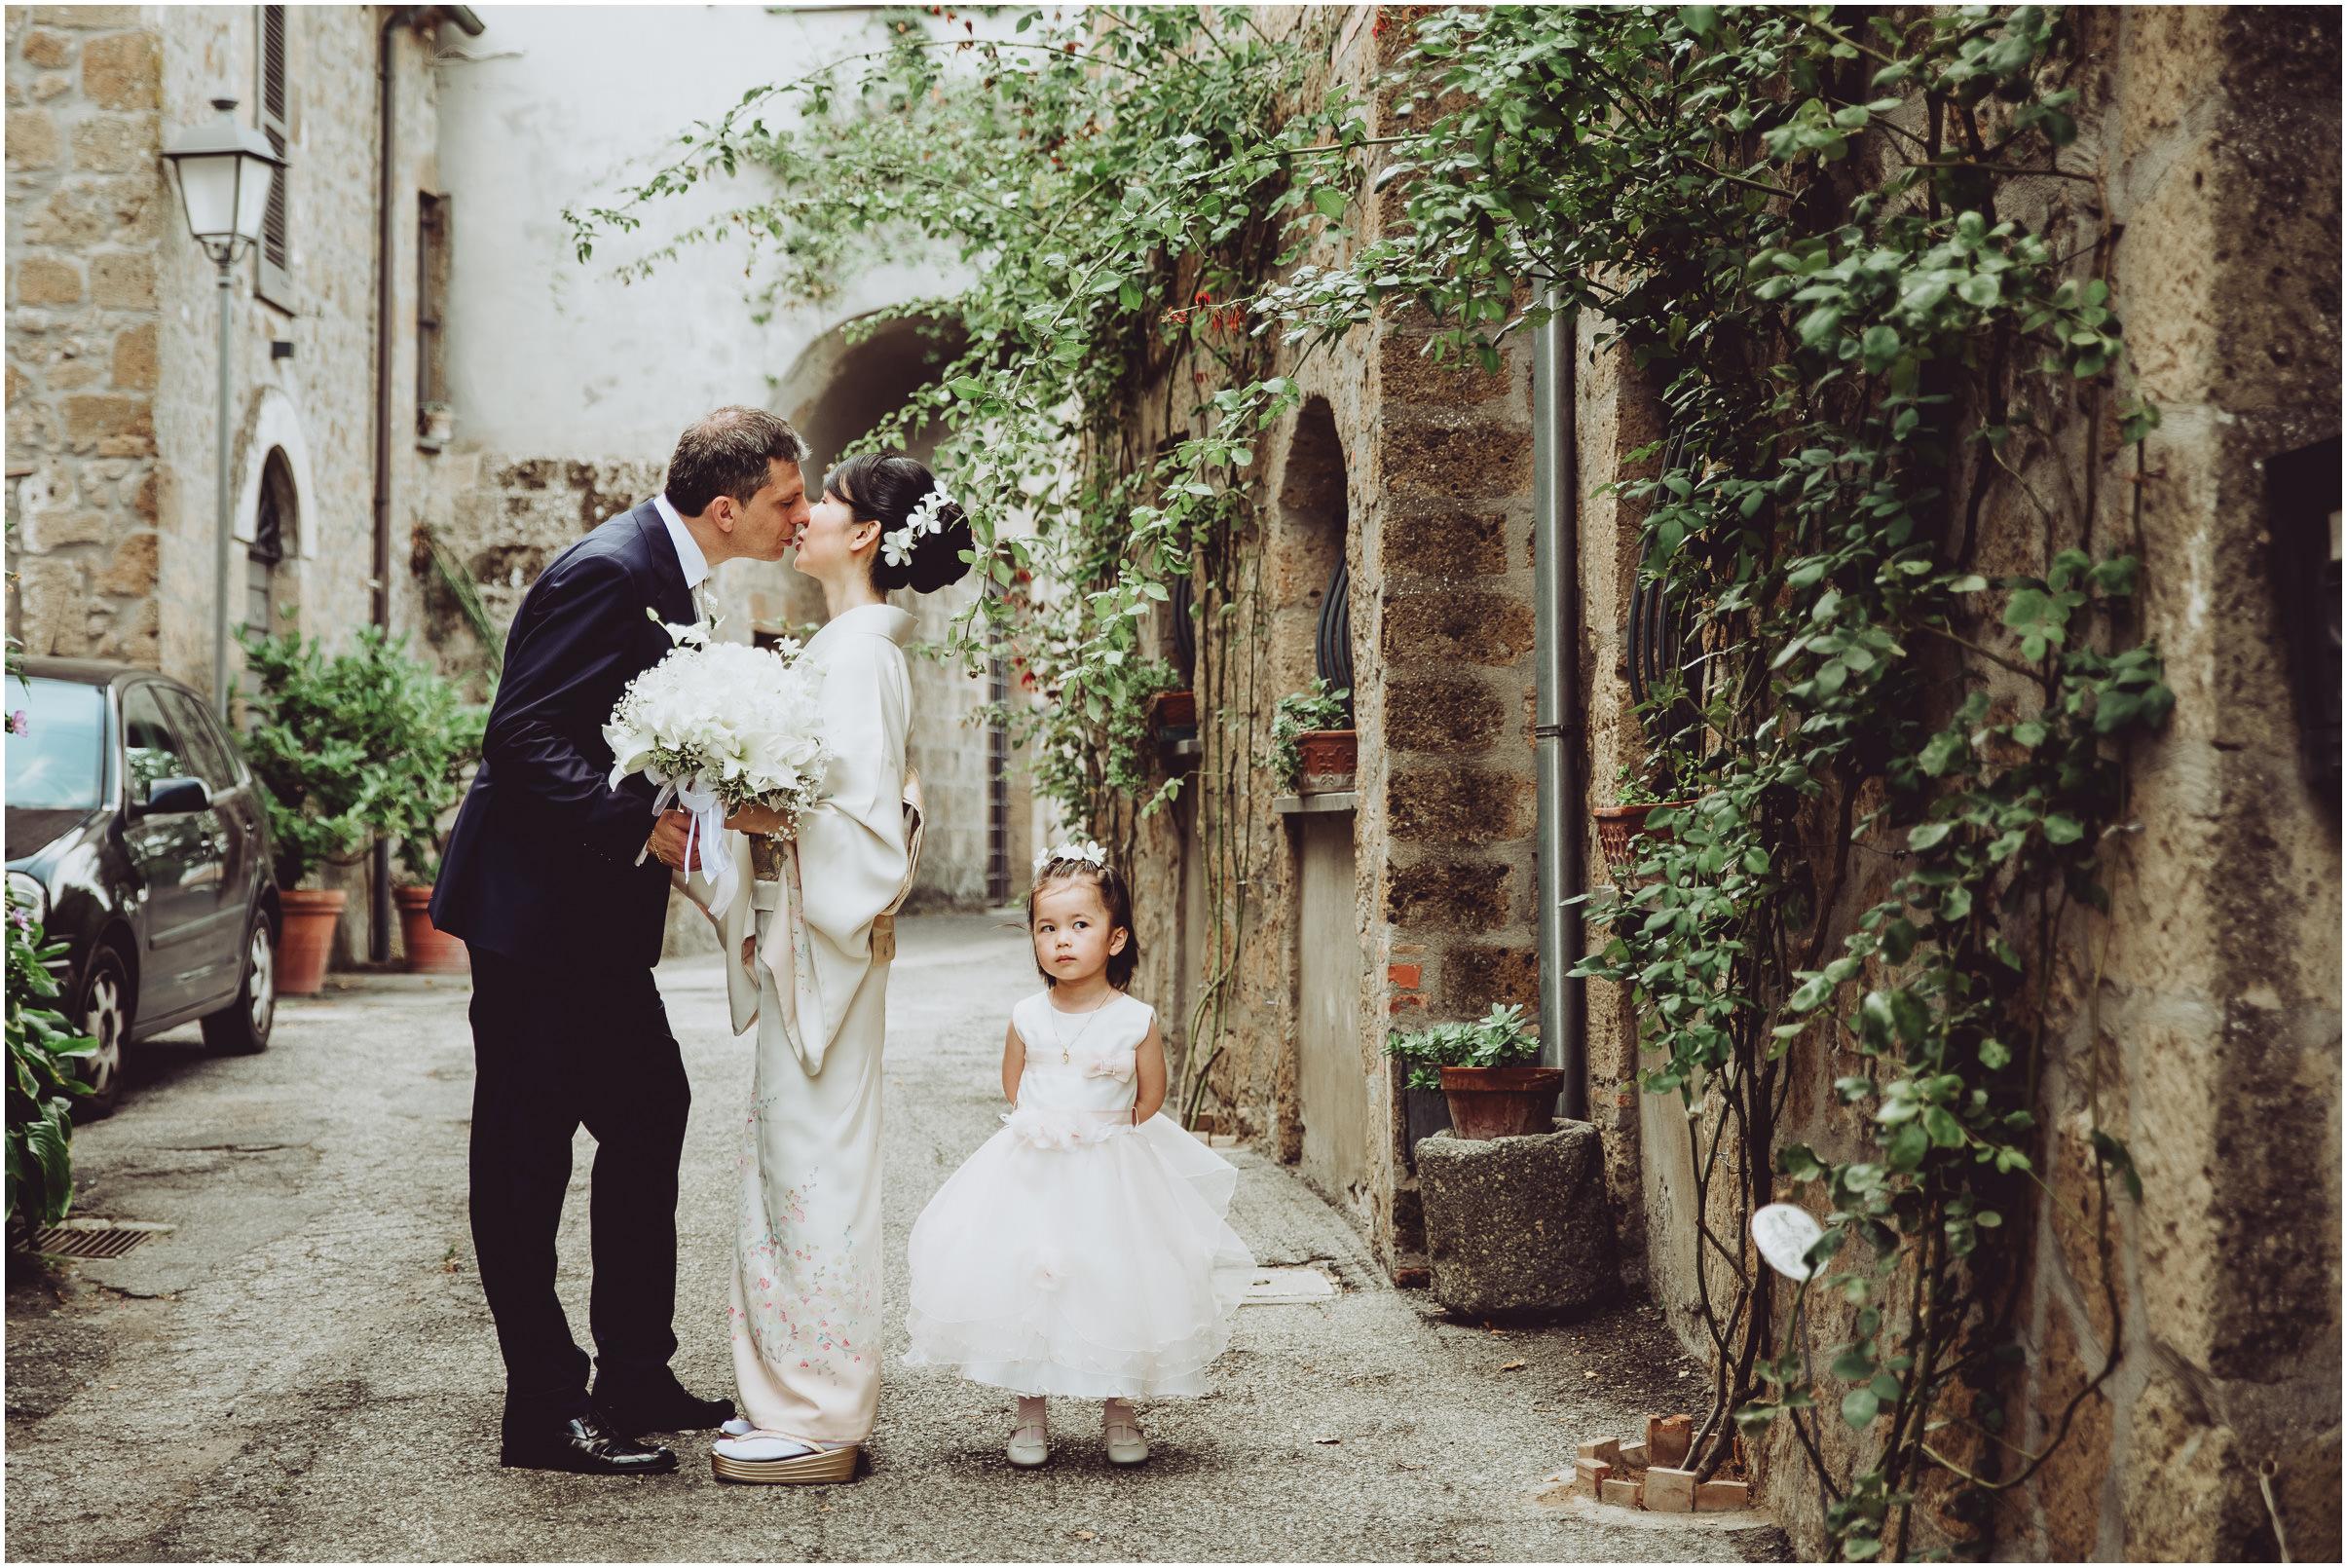 WEDDING-PHOTOGRAPHY-SARA-LORENZONI-FOTOGRAFIA-MATRIMONIO-ORVIETO-JUKA-ANTONELLO28